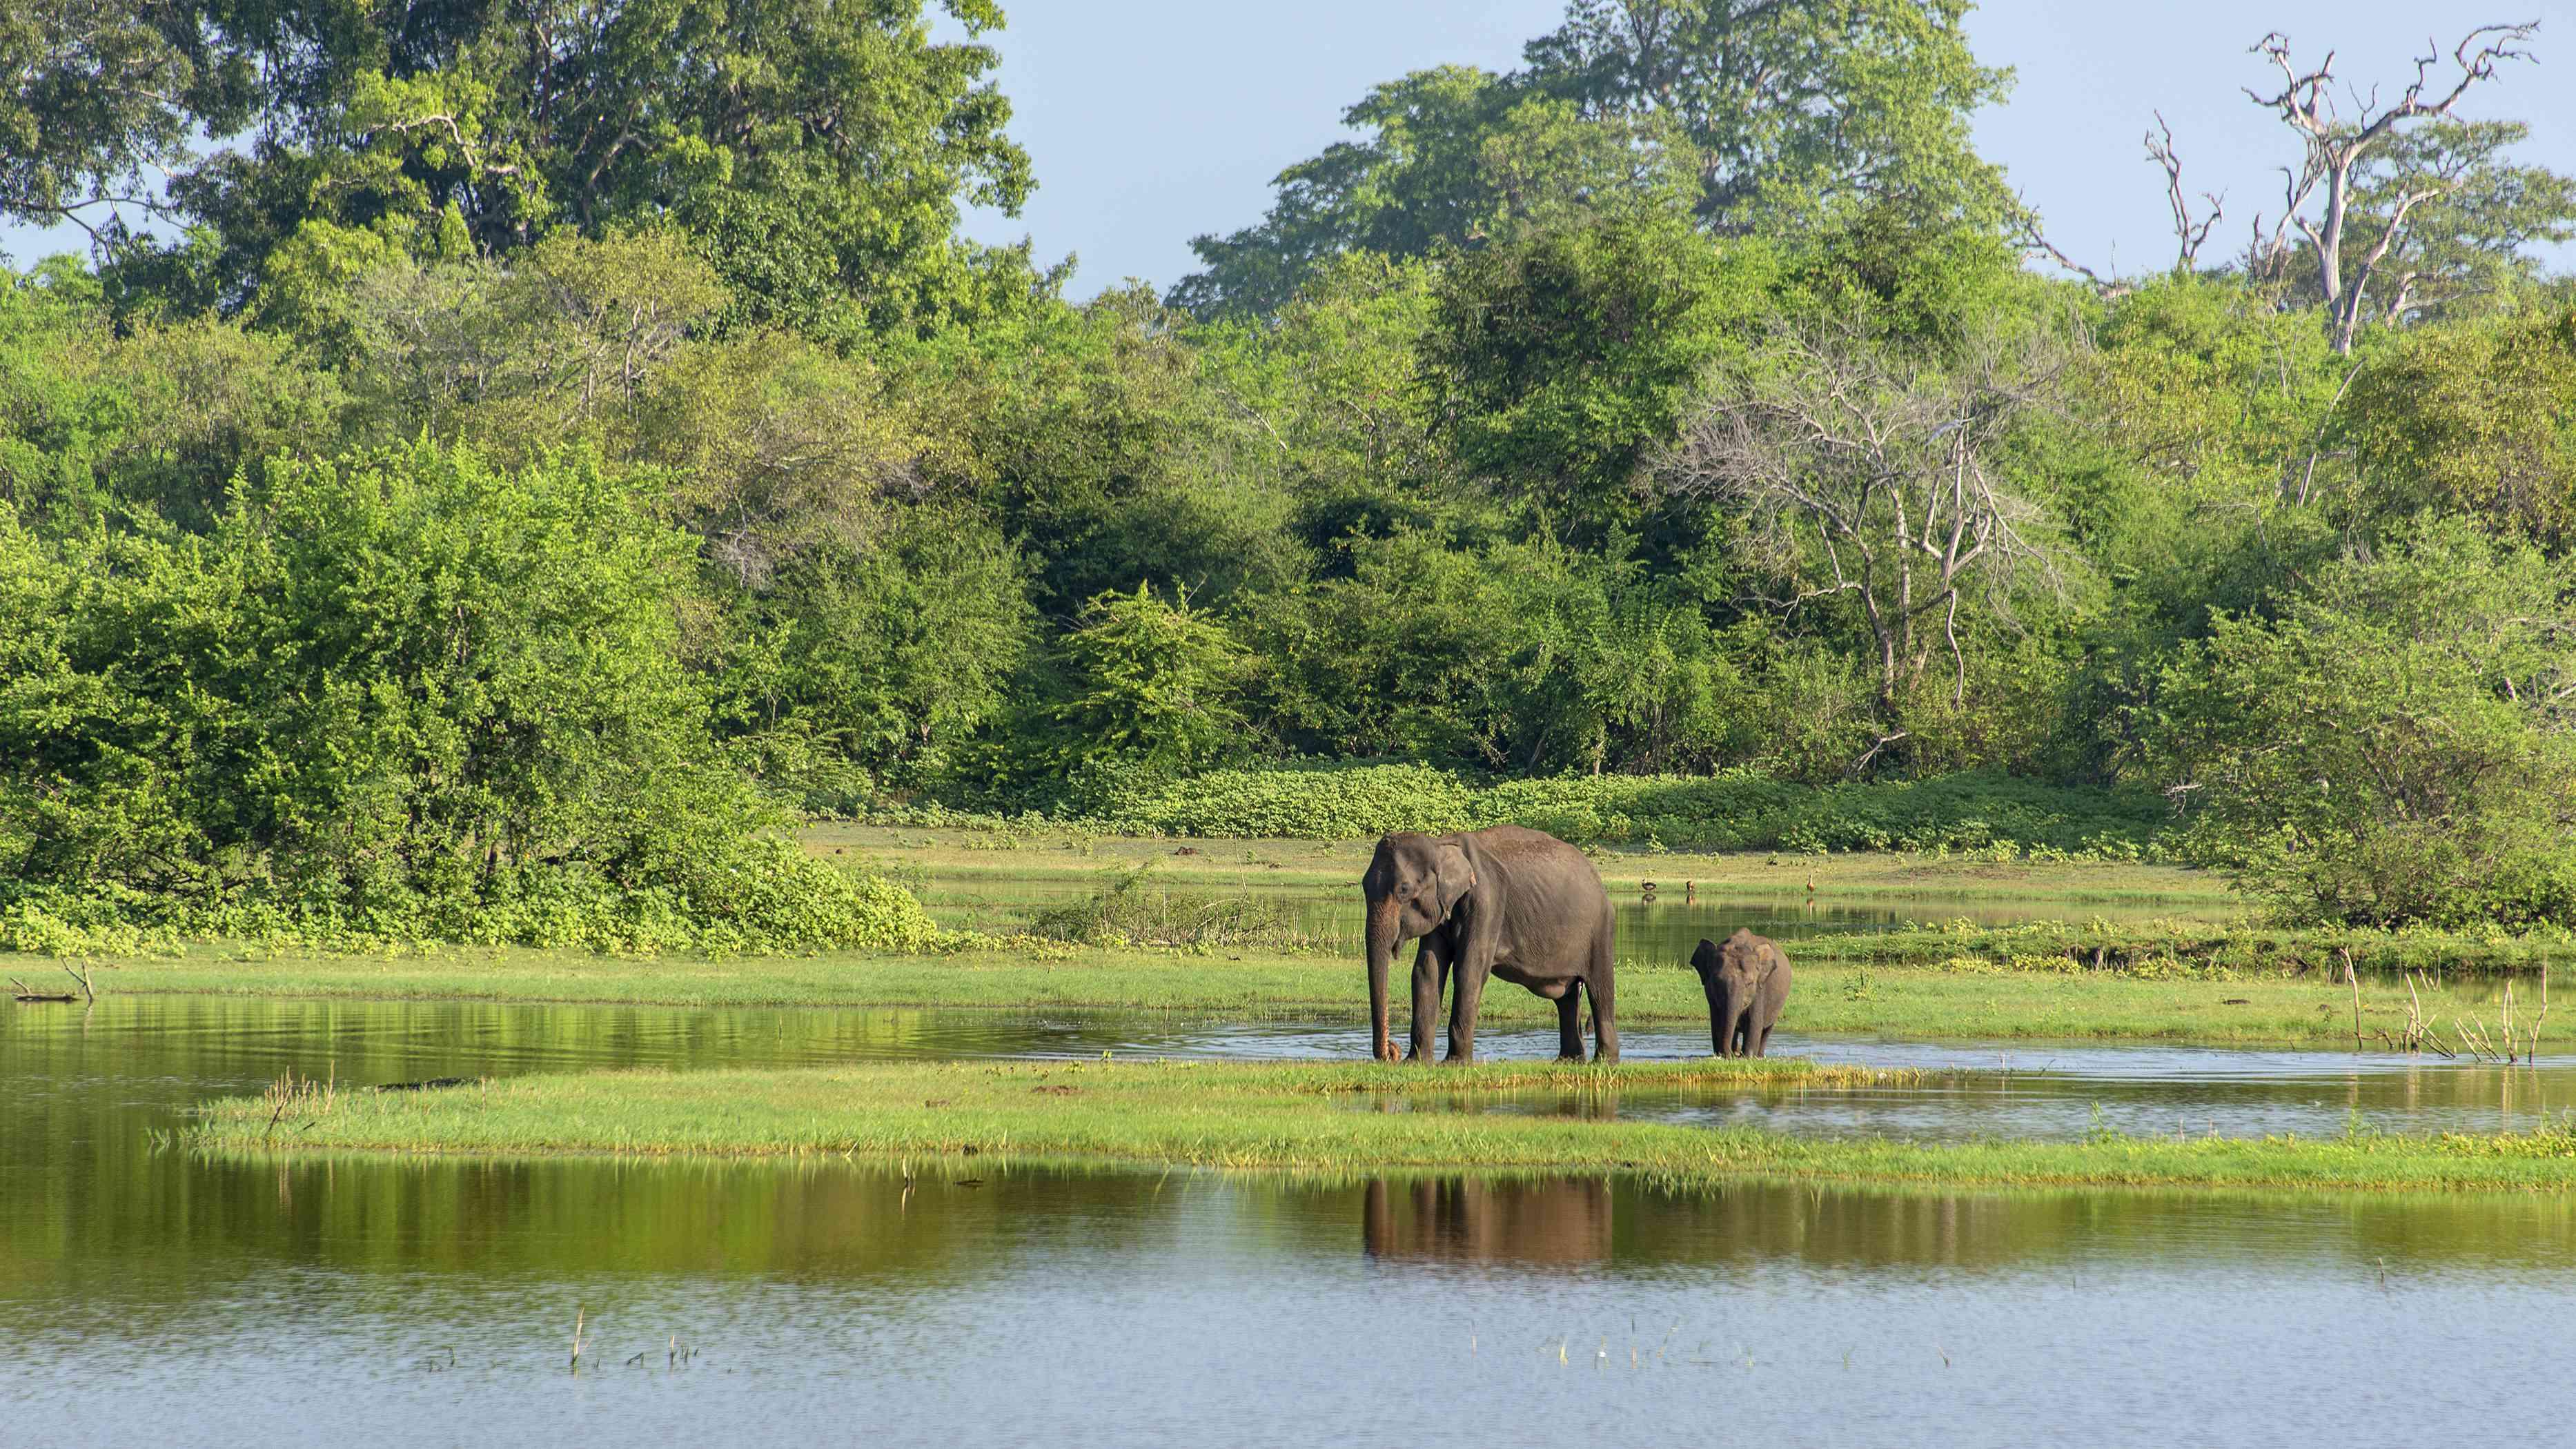 Big and baby elephants in Yala National Park, Sri Lanka